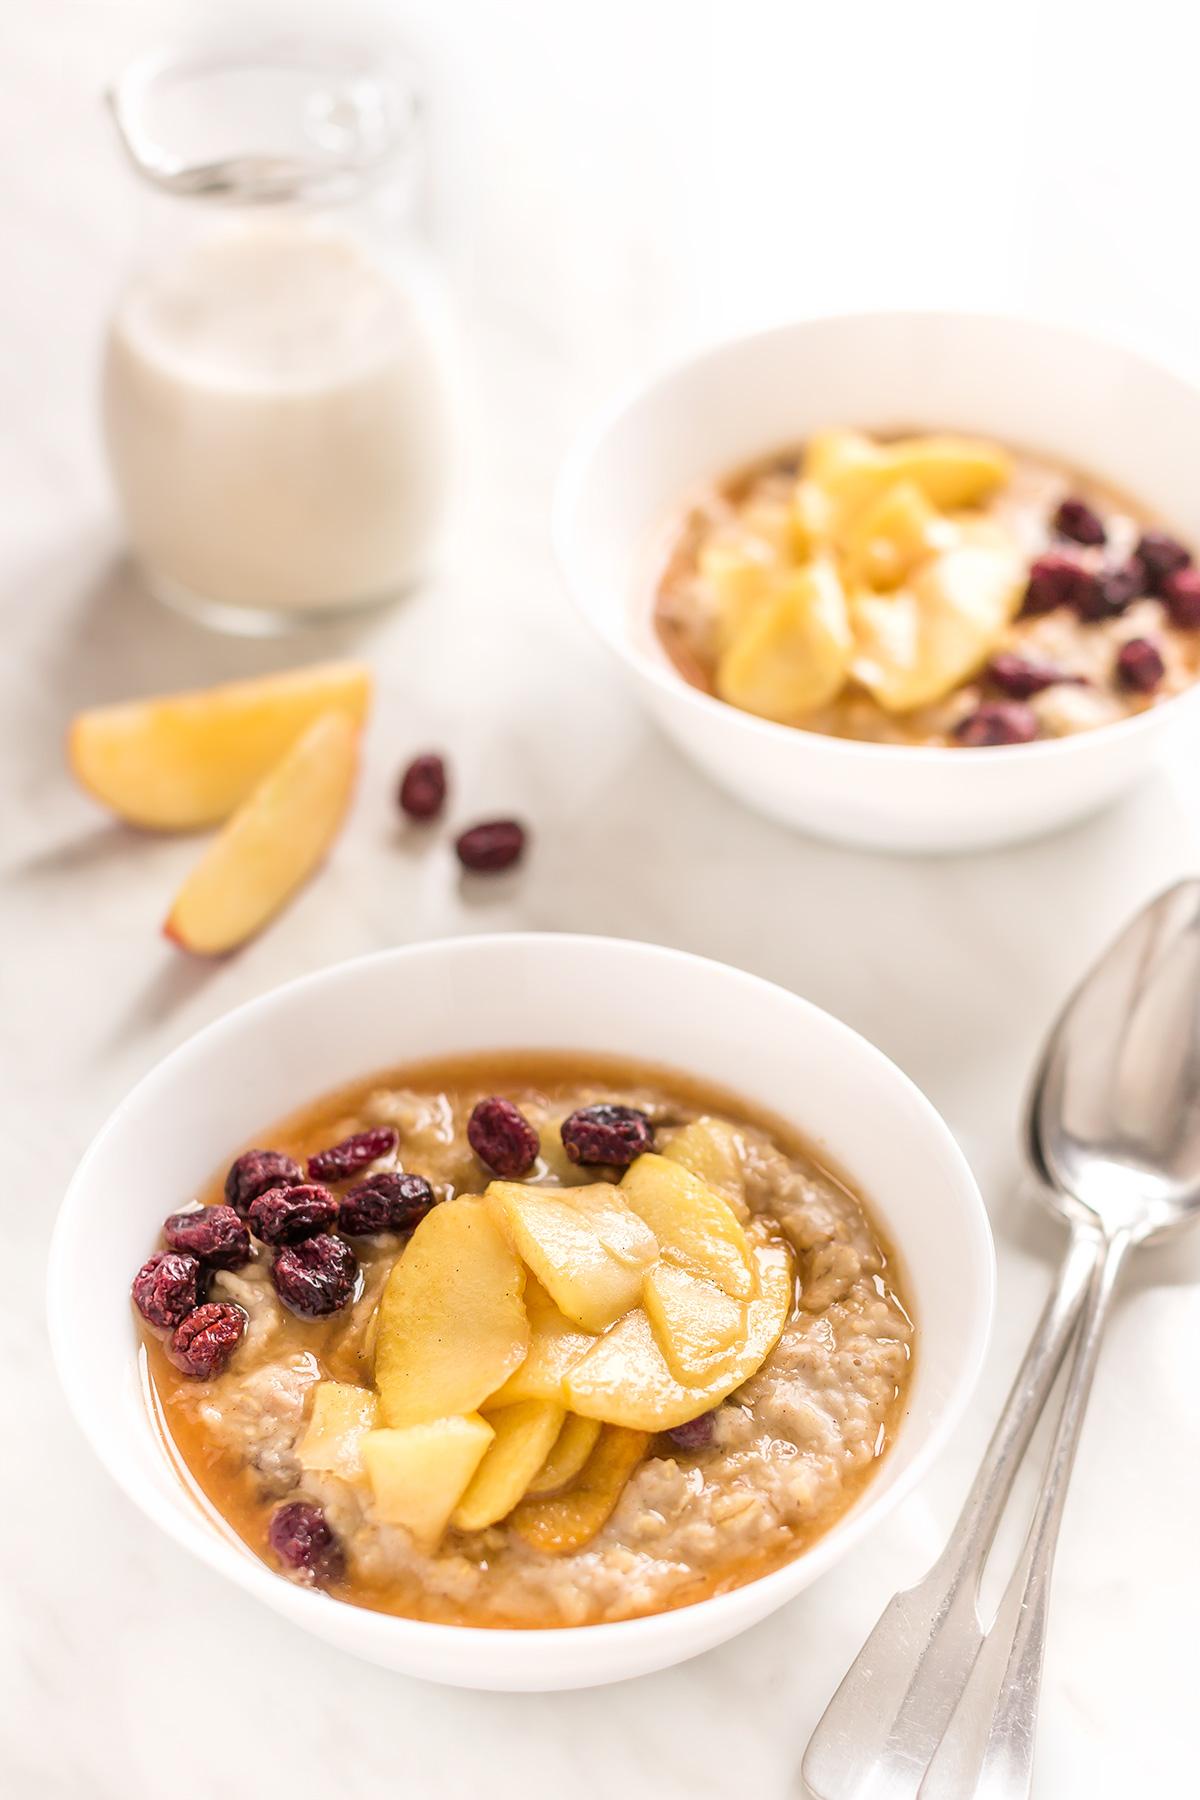 porridge di avena alle mele caramellate e cannella - vegan caramelized apple oatmeal with cinnamon